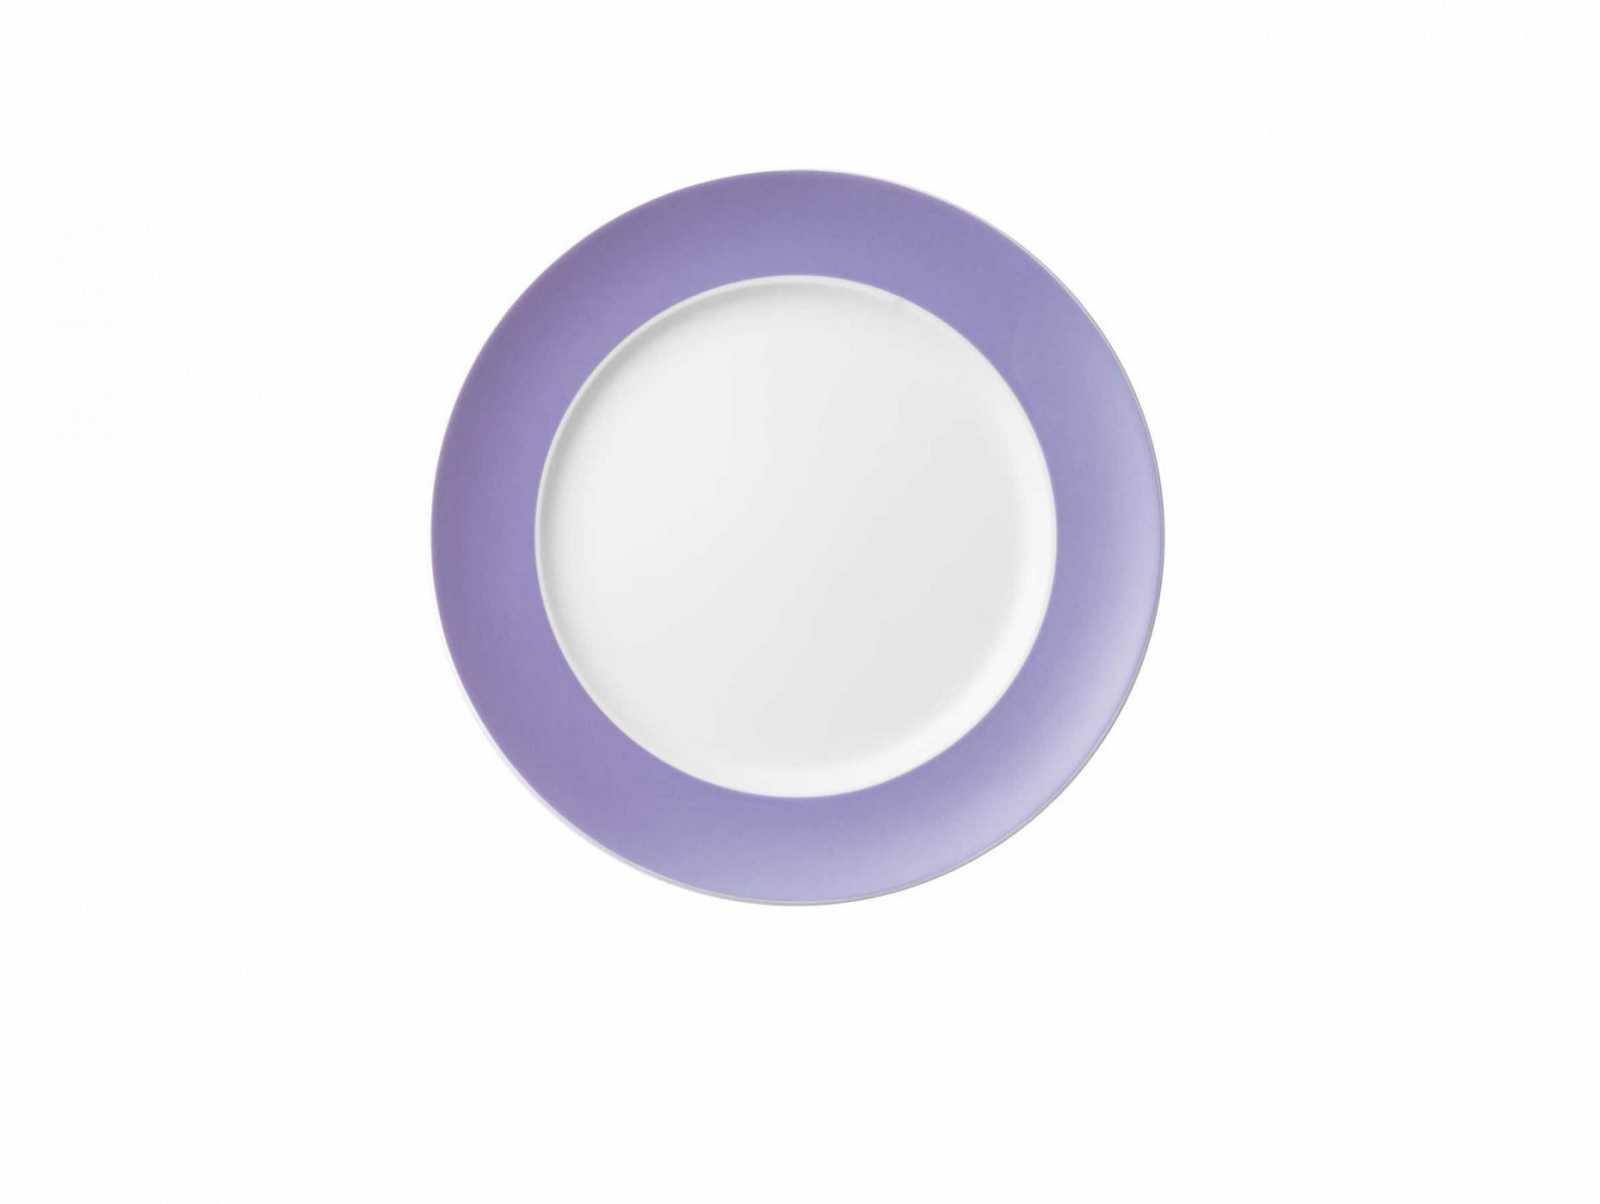 Онлайн каталог PROMENU: Тарелка основная Rosenthal SUNNY DAY, диаметр 27 см, фиолетовый Rosenthal 10850-408531-10227